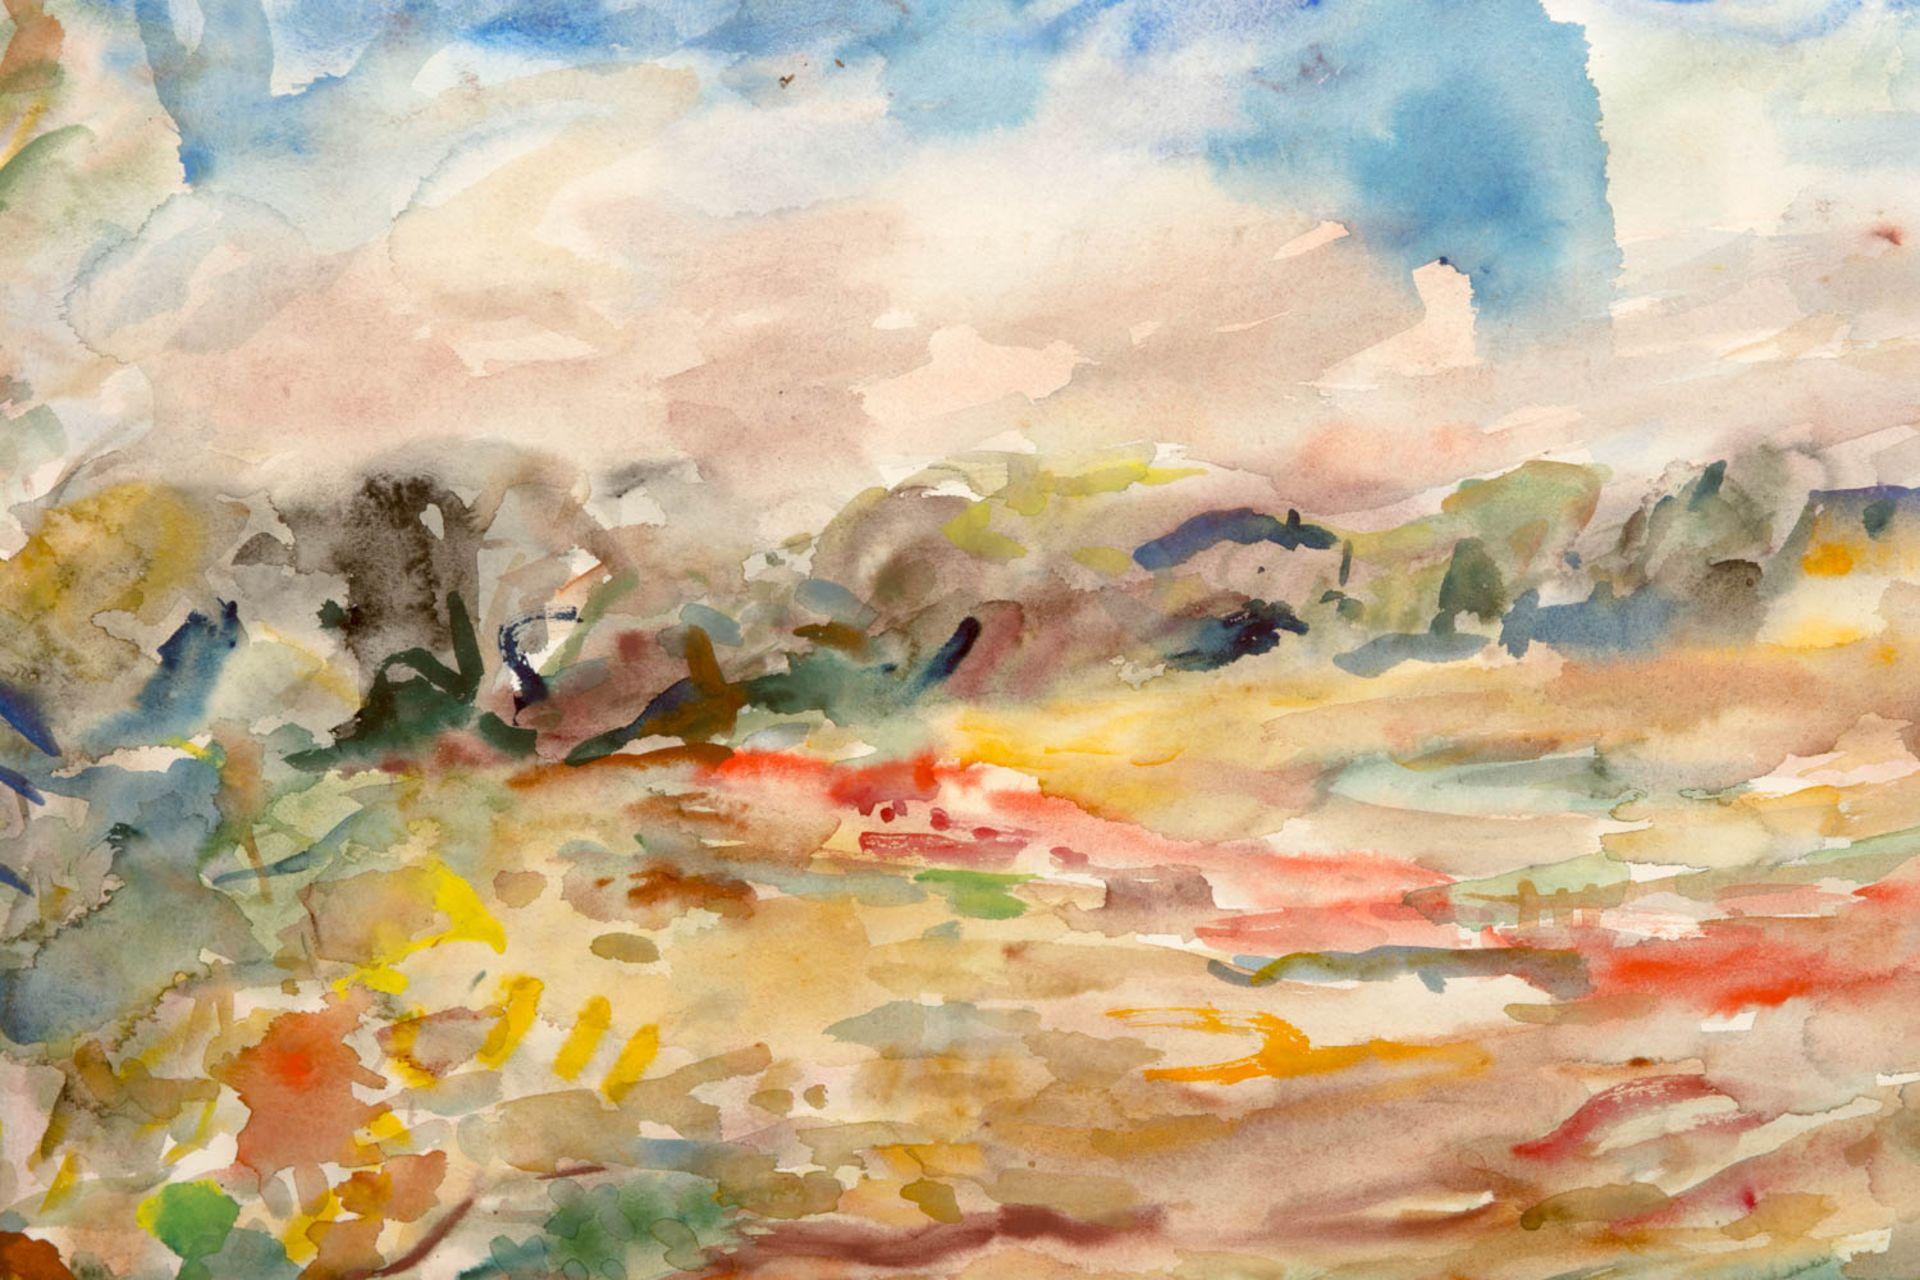 Manfred Henninger, Landschaftsansicht, Aquarell, 1944. - Bild 2 aus 4